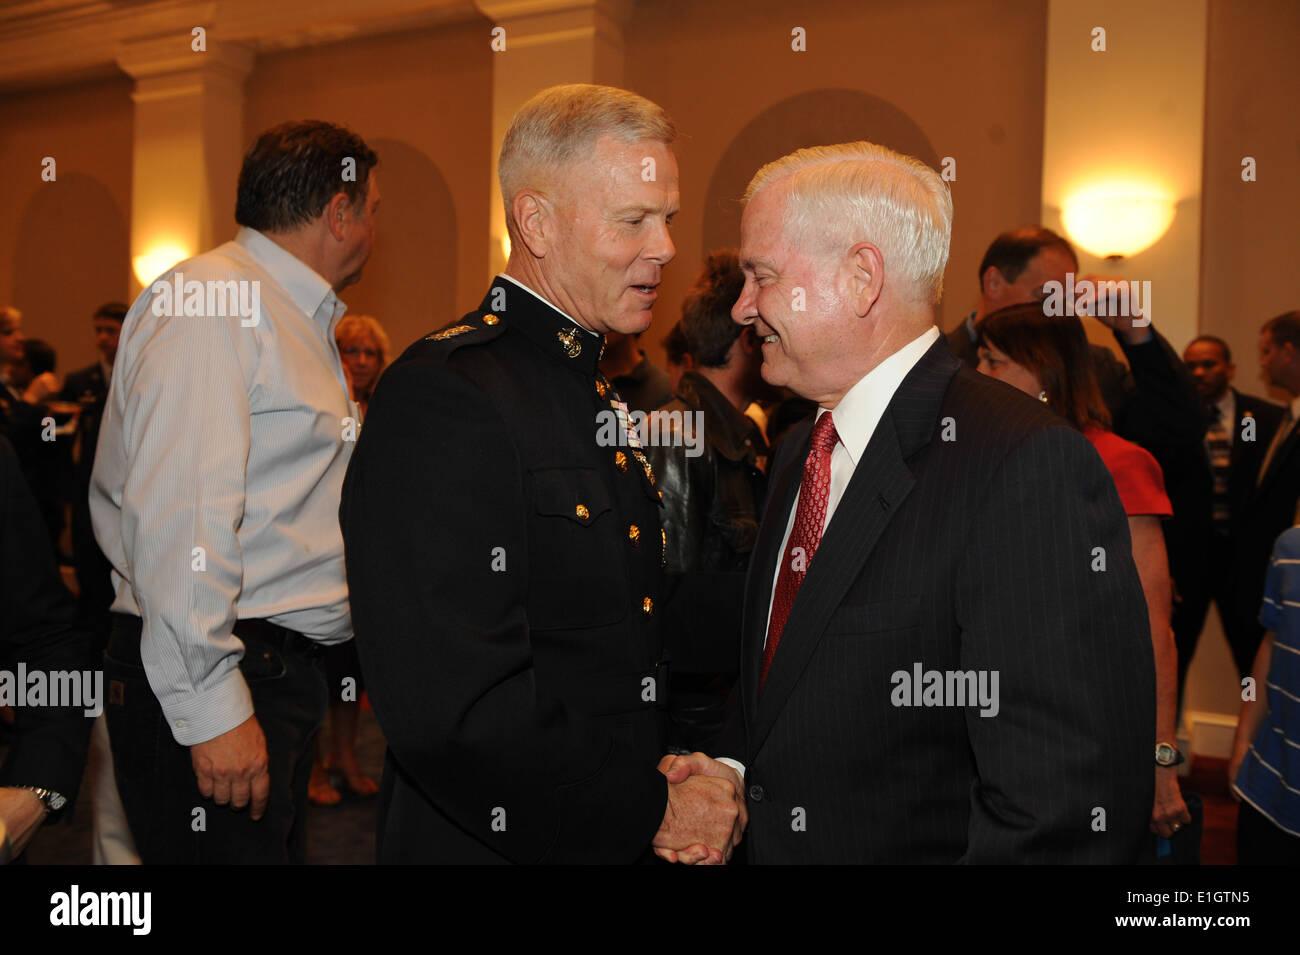 Commandant of the Marine Corps Gen. James F. Amos, left, shakes the hand of Secretary of Defense Robert M. Gates Stock Photo